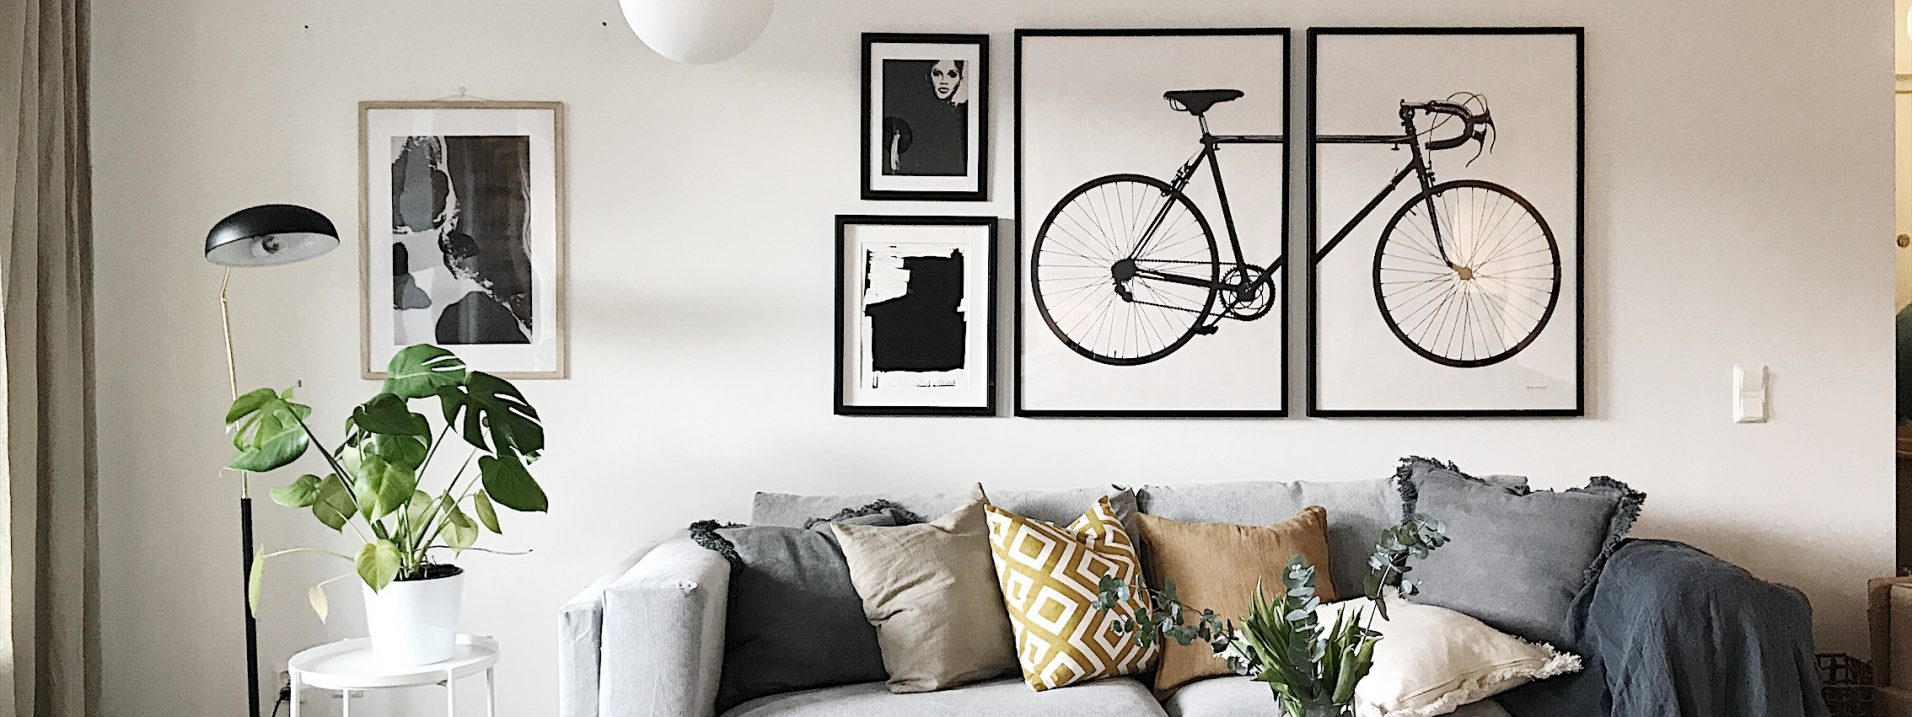 Homestyling - Göteborg - Studio In